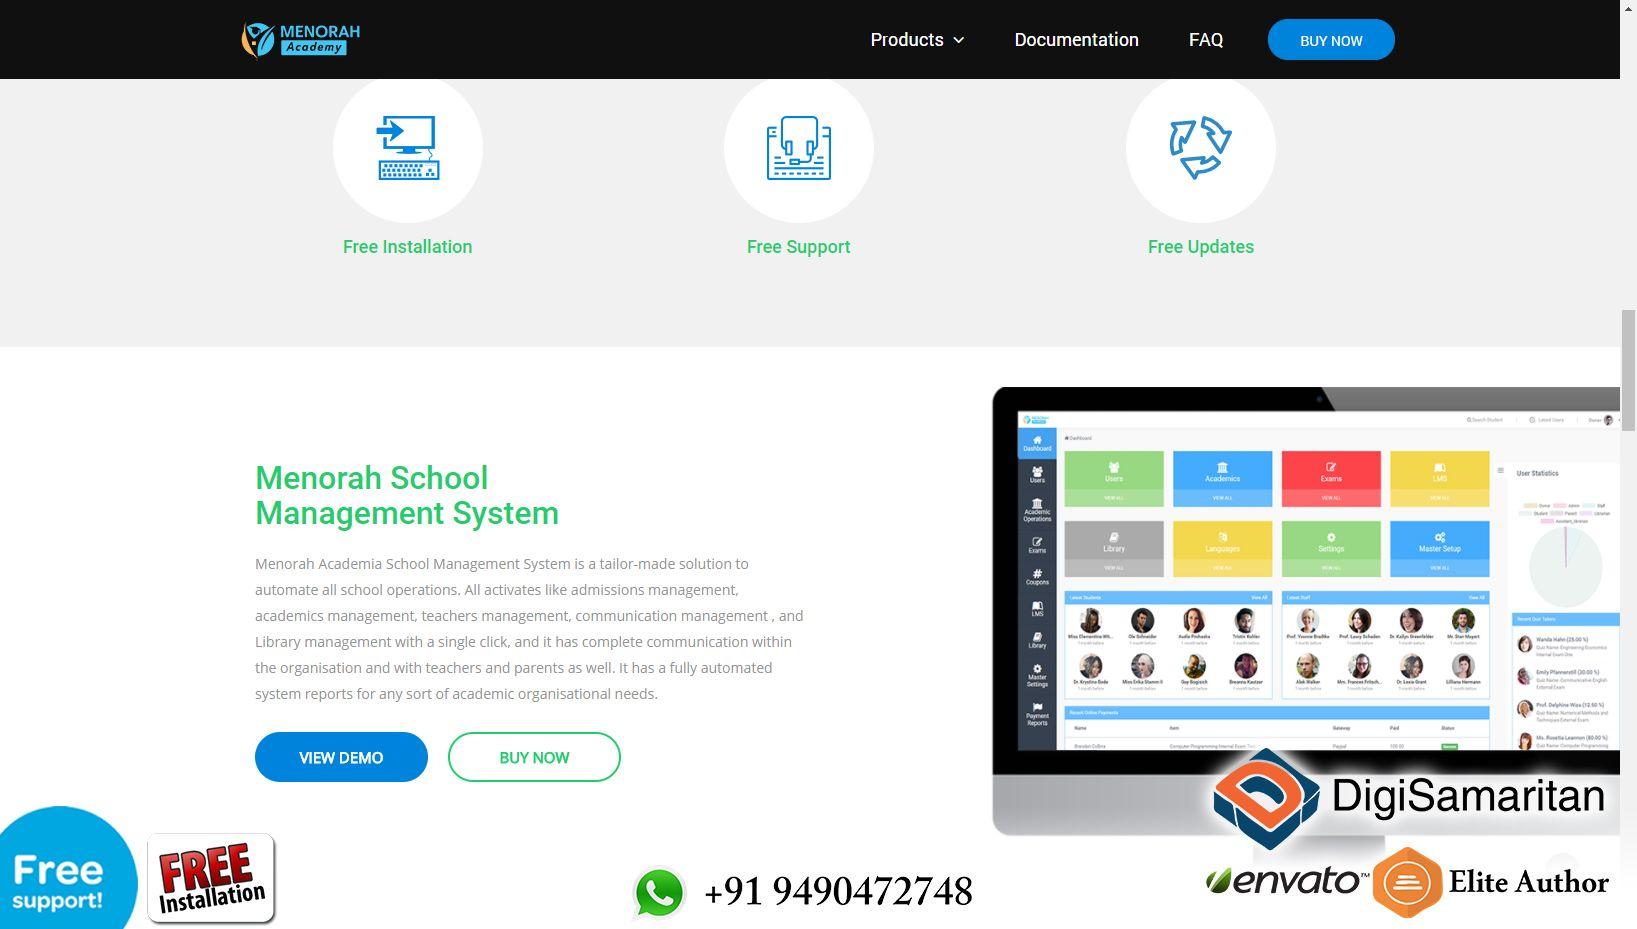 The Next Gen School Management Software - Menorah Academy